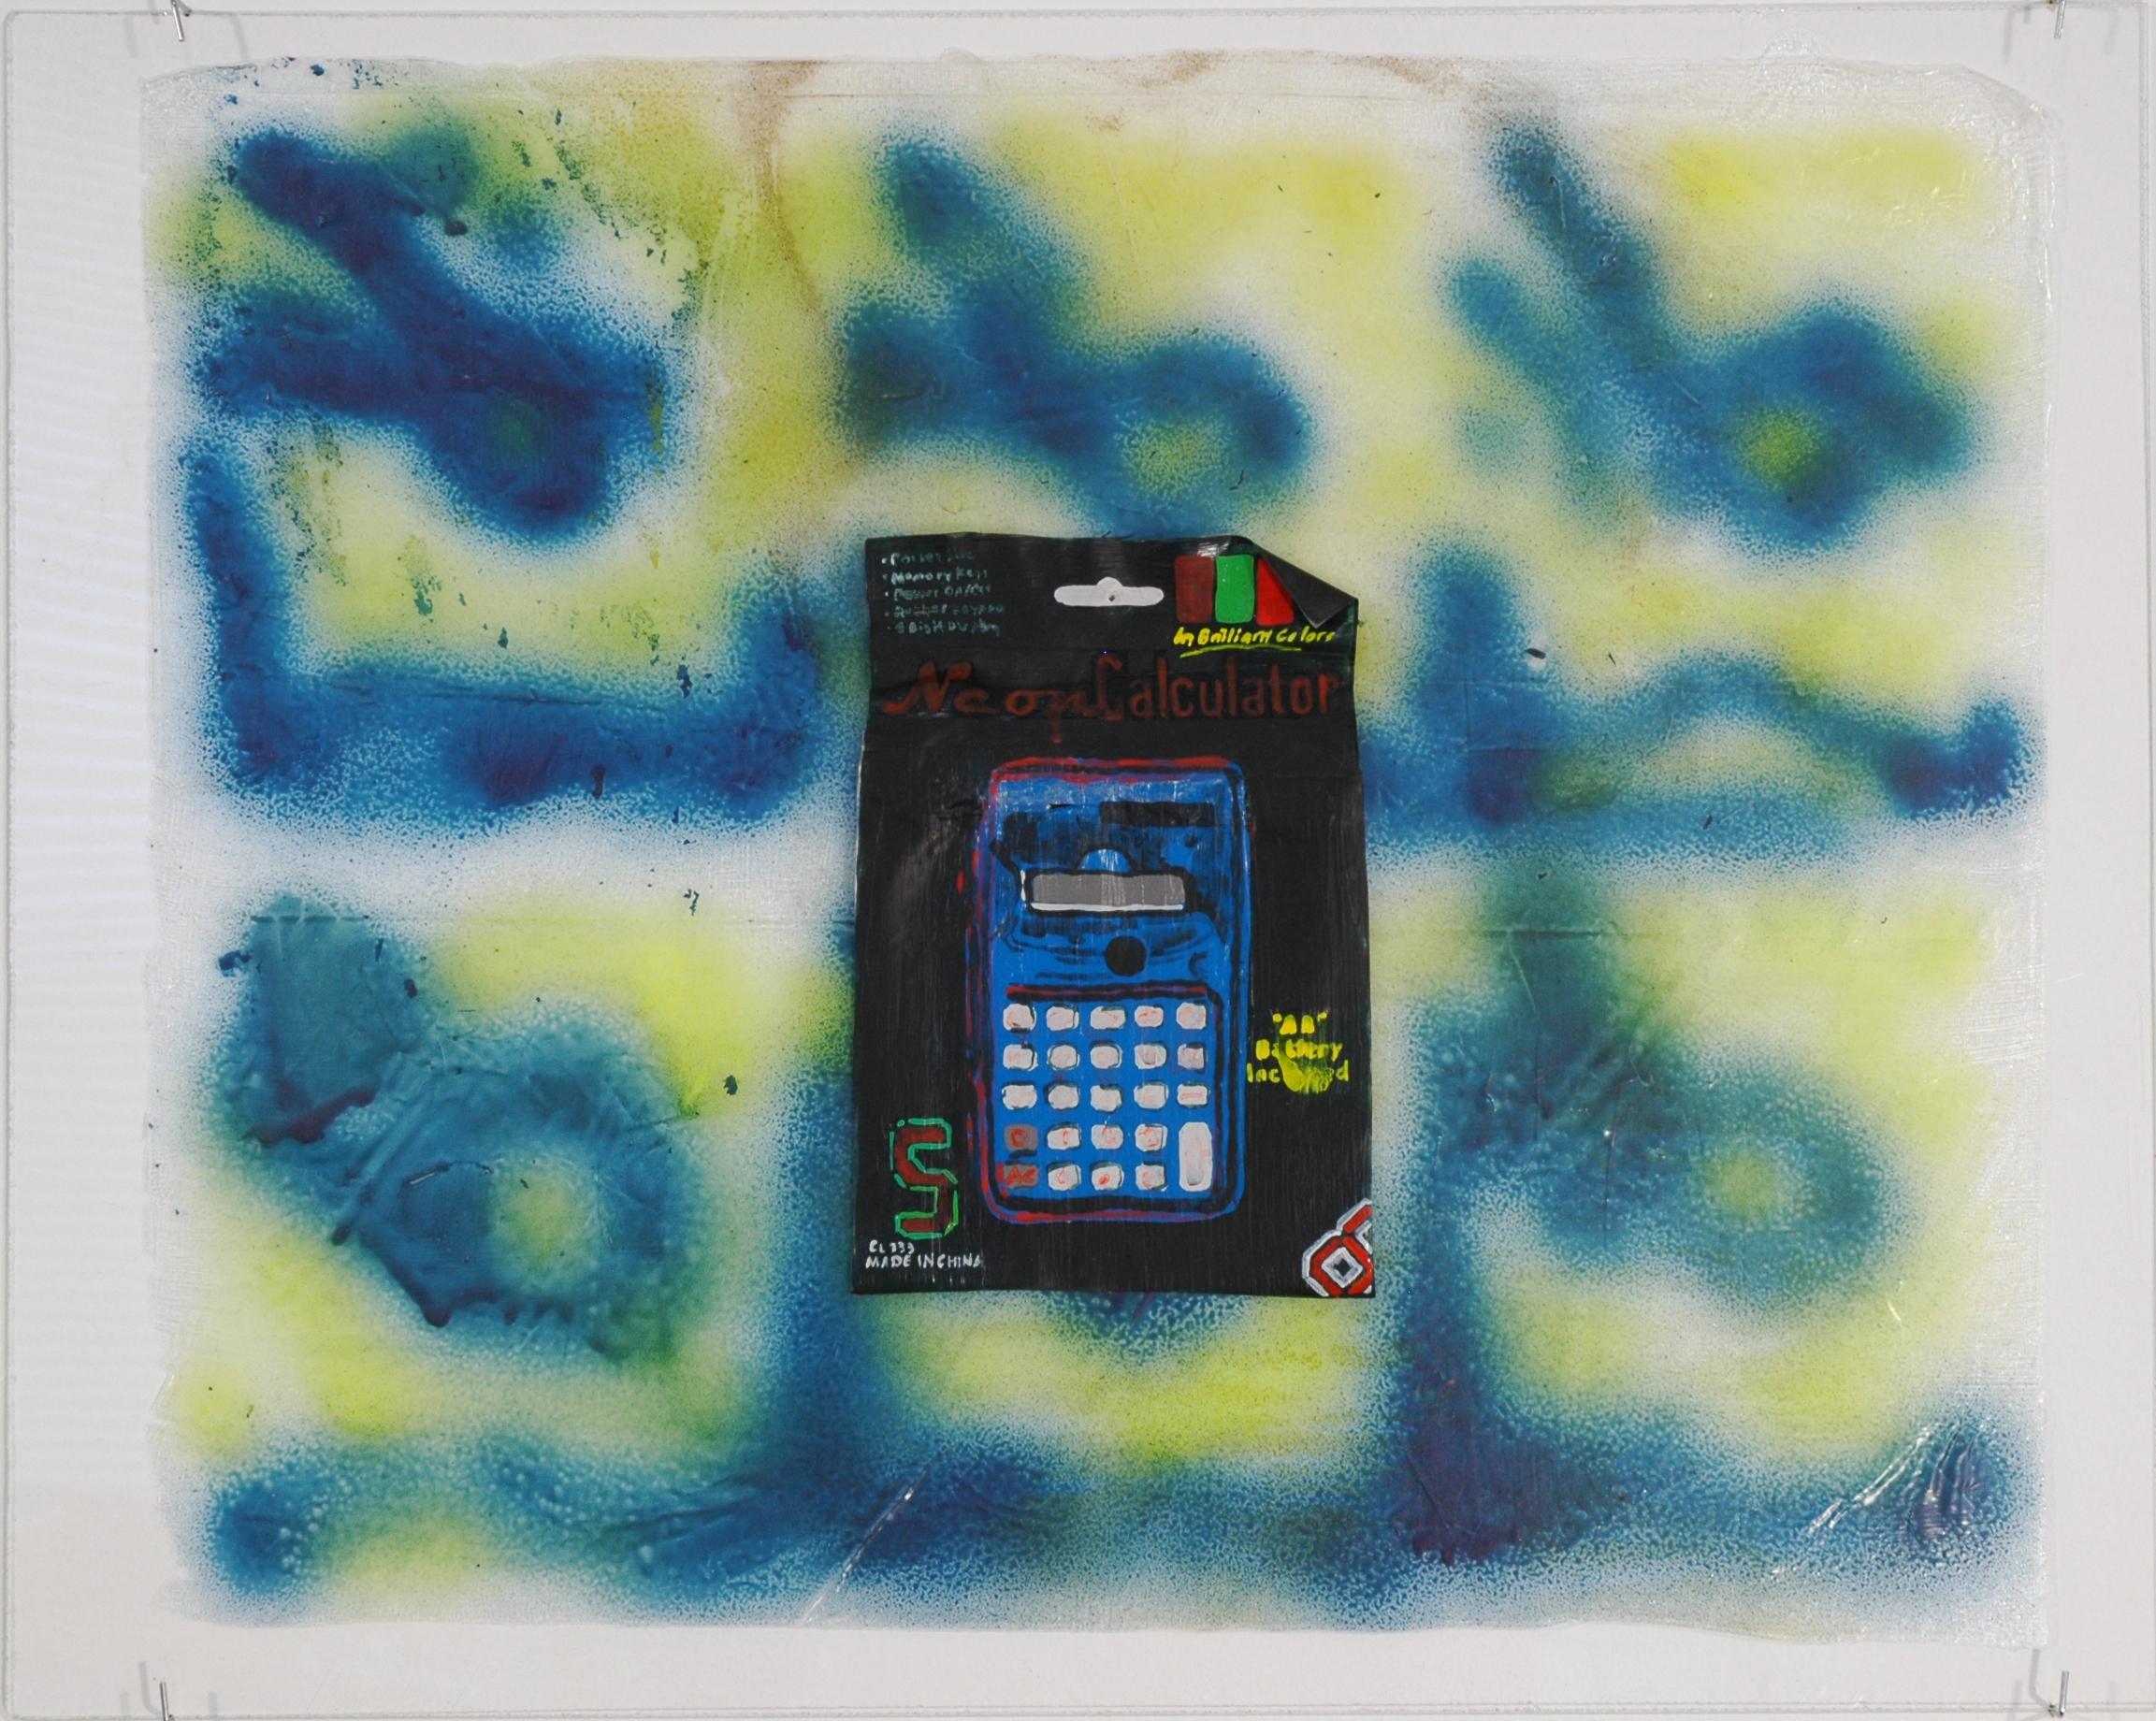 59-calculator copy.jpg